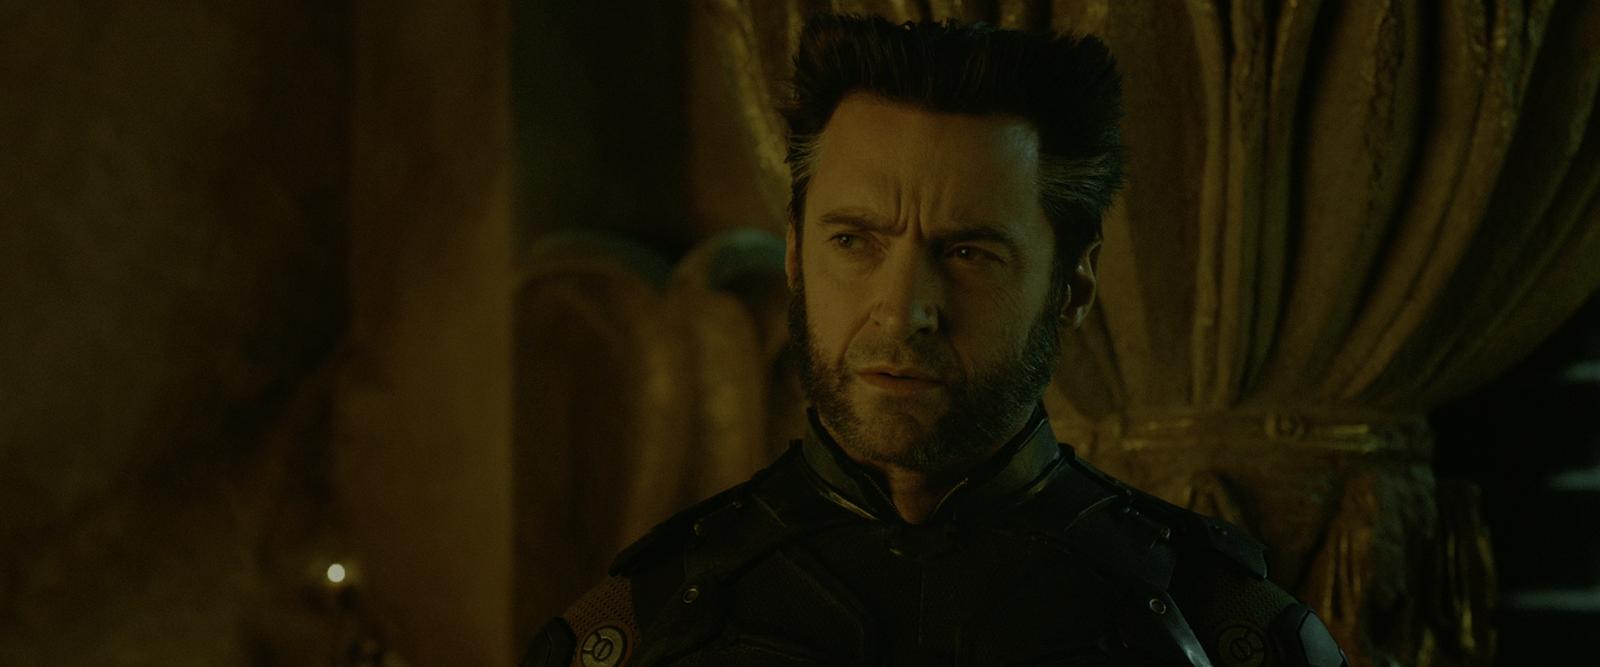 X-Men: Días del Futuro Pasado (2014) 4K UHD [HDR] Latino - Castellano - Ingles captura 1